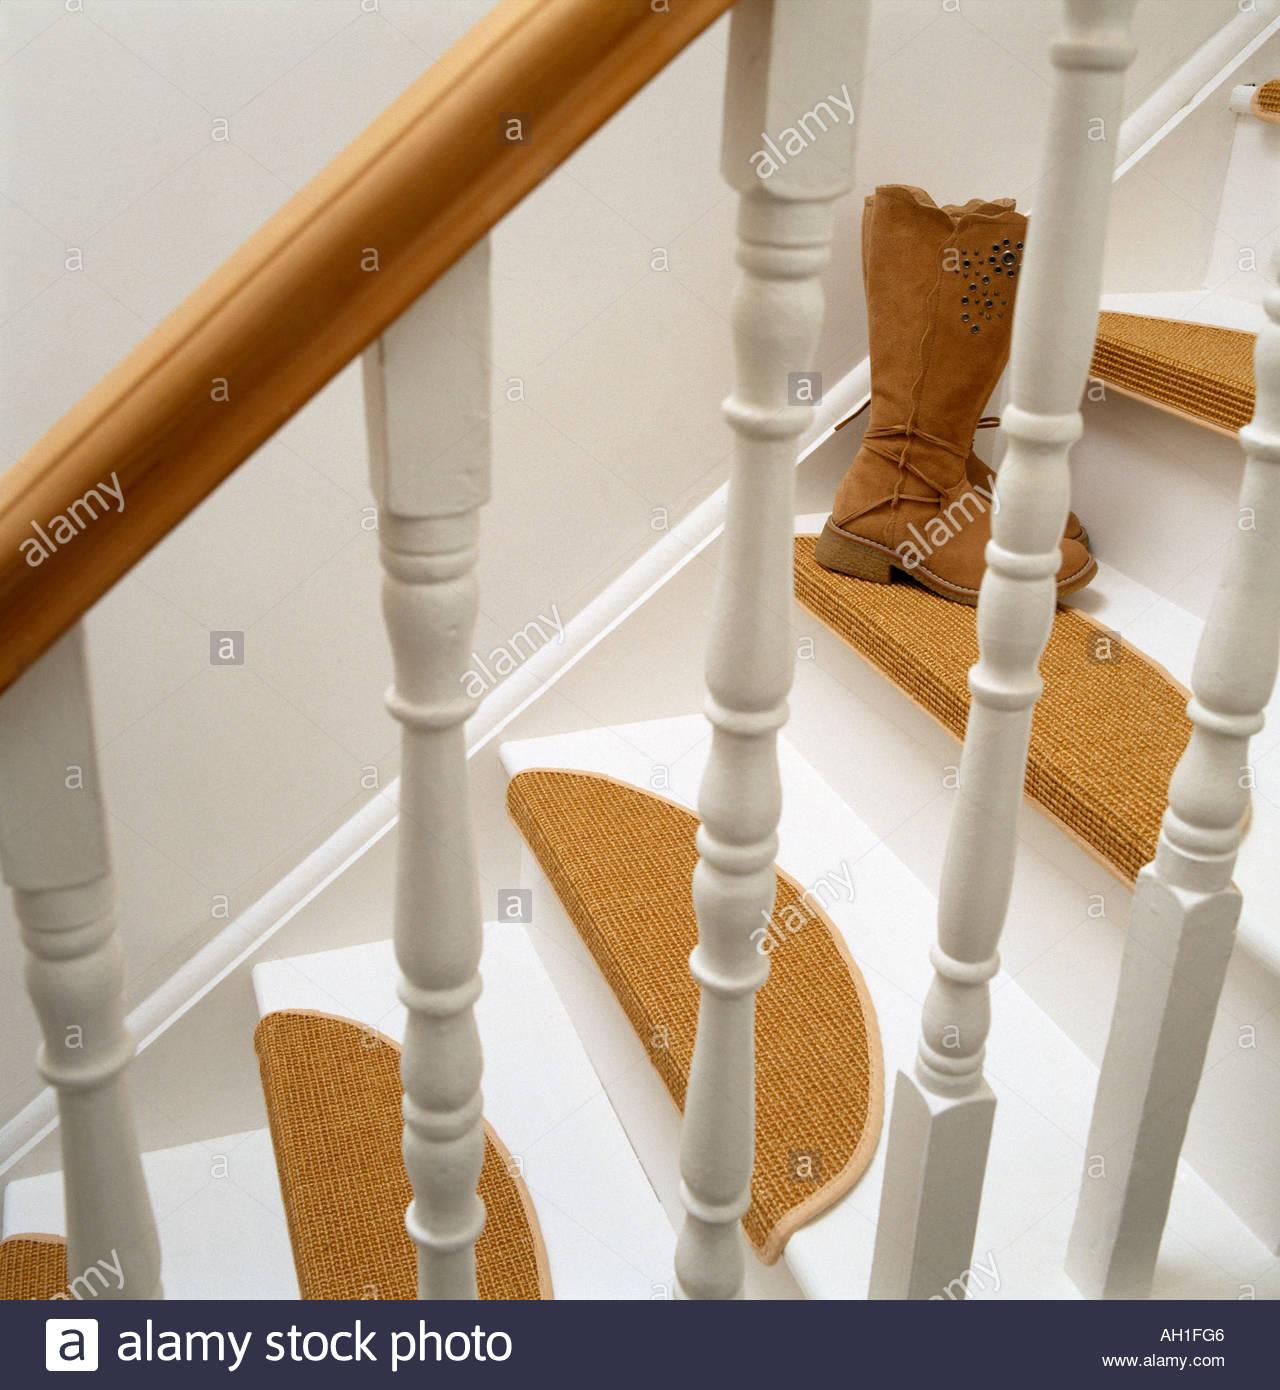 Teppich Stufen auf Treppe Stockfoto, Bild: 8186949 - Alamy